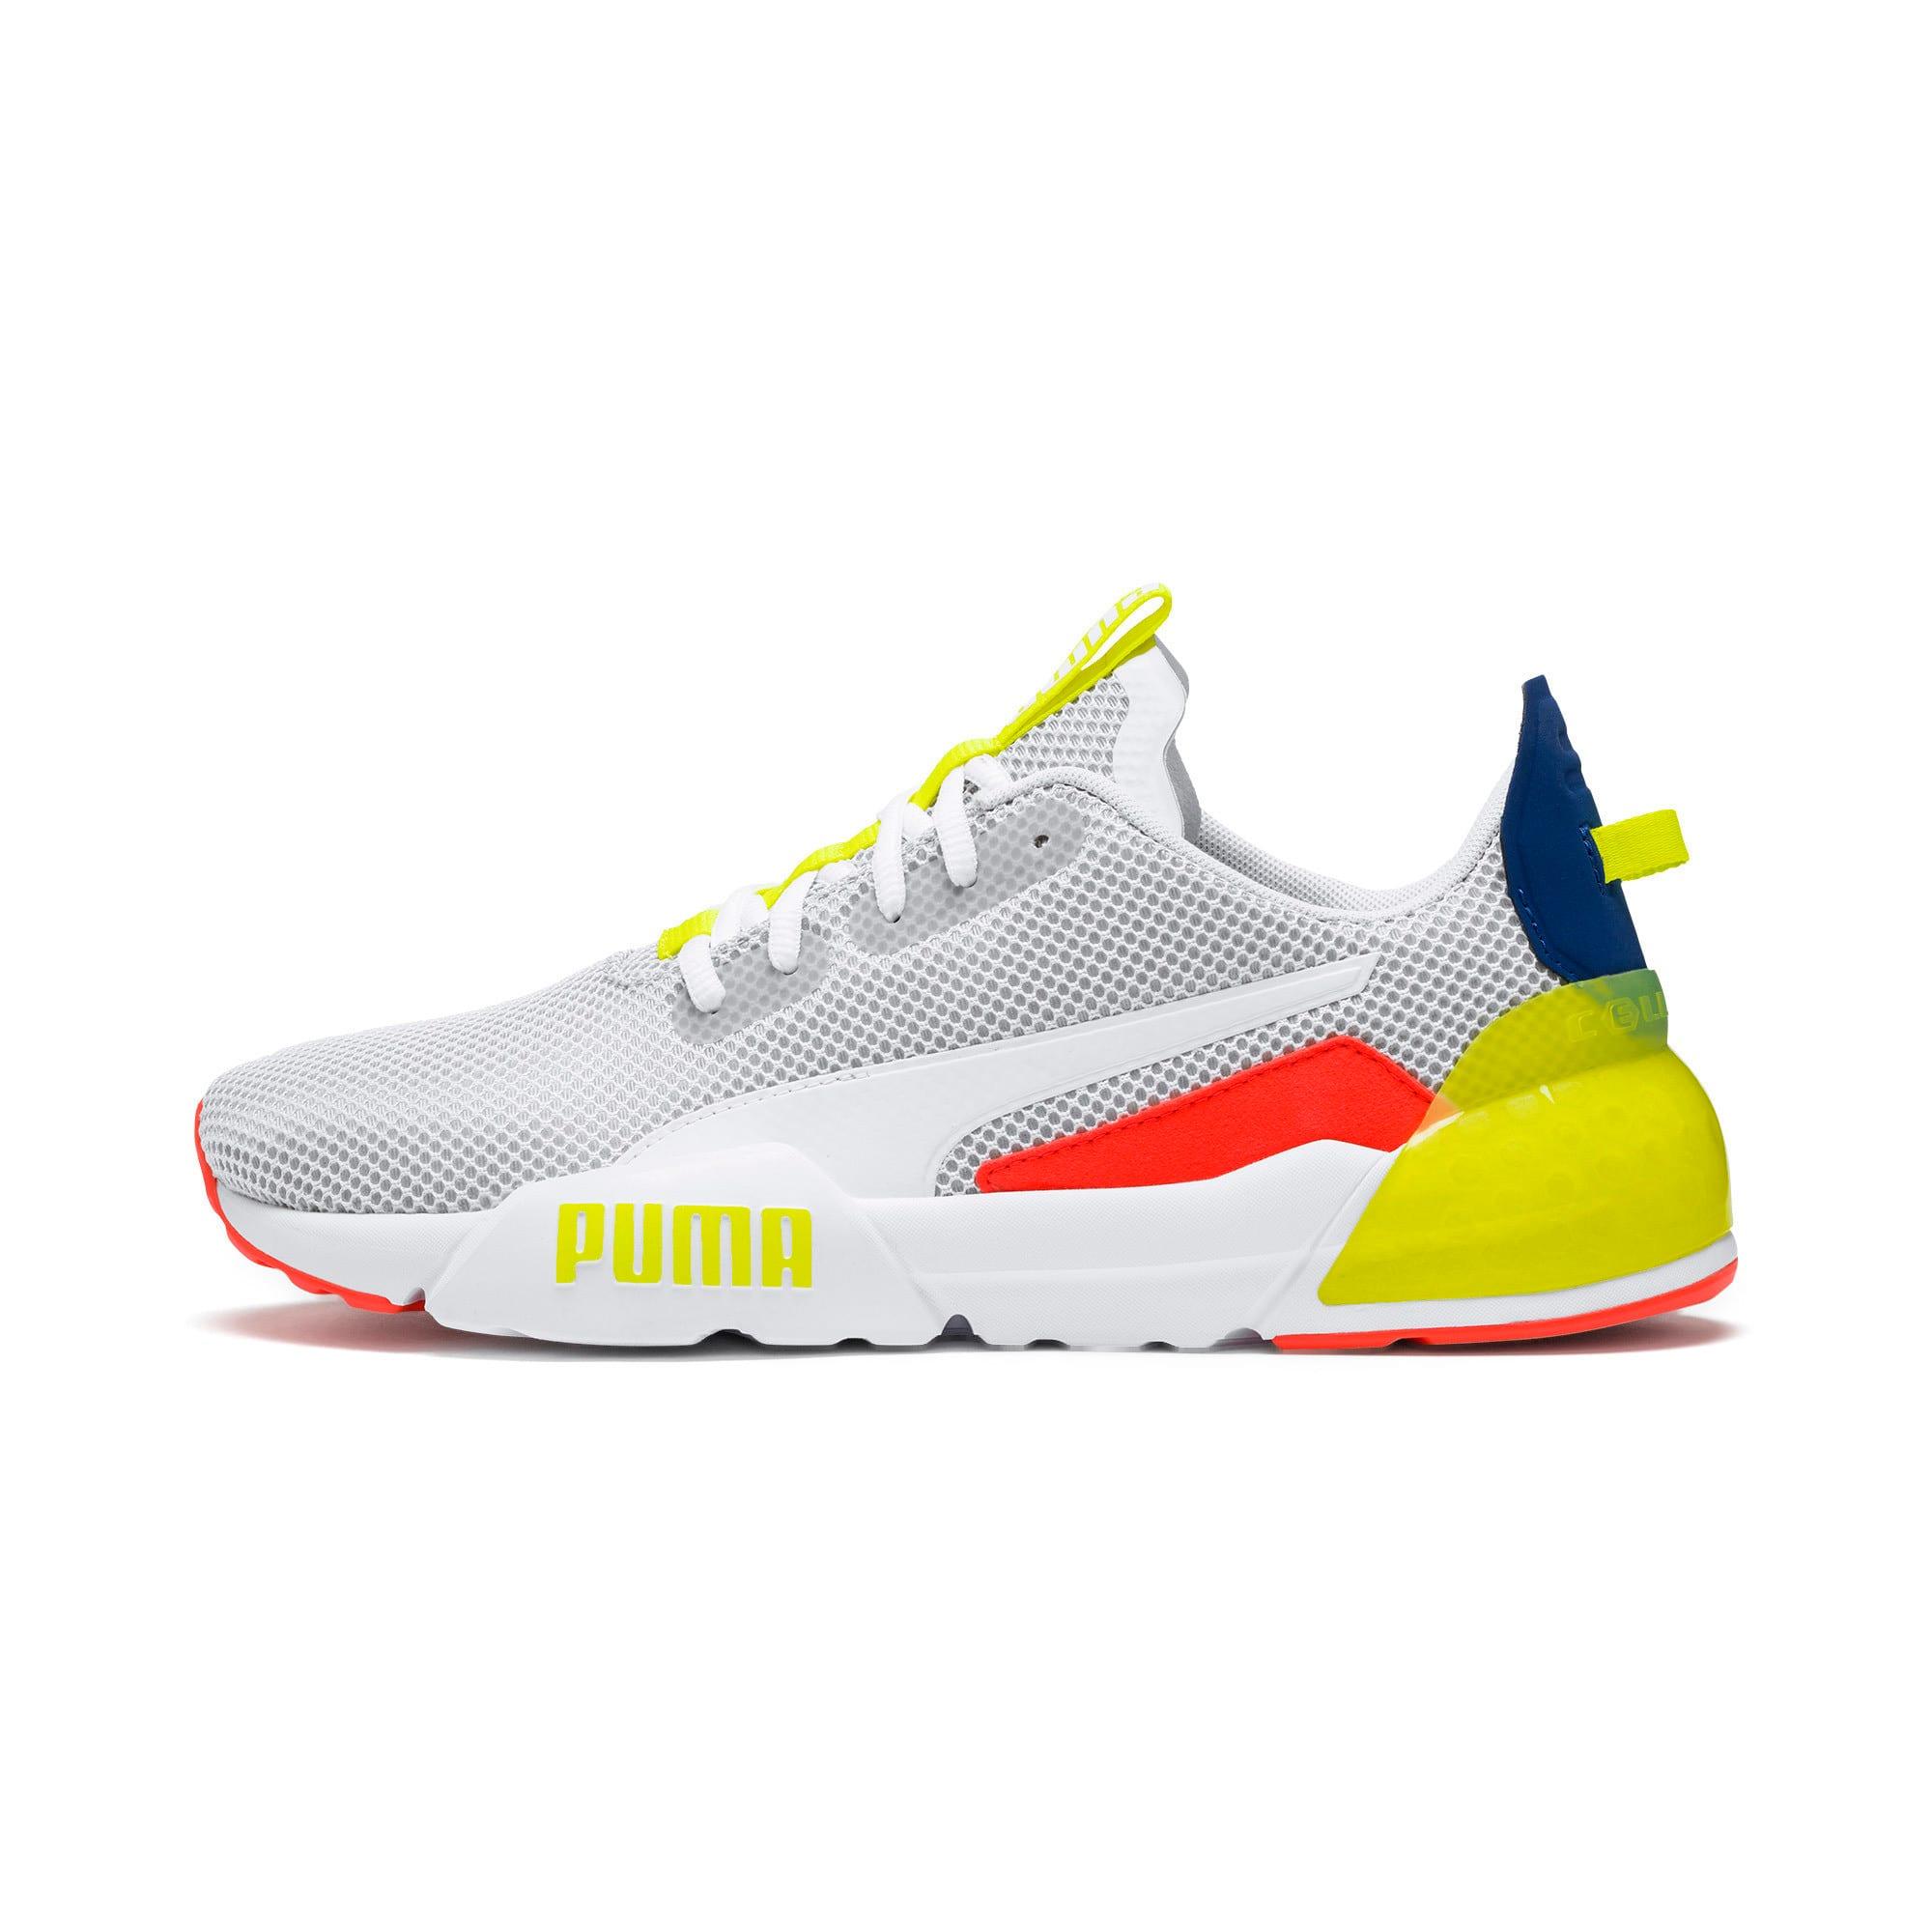 Thumbnail 1 of CELL Phase Men's Training Shoes, White-GalaxyBlue-YellowAlert, medium